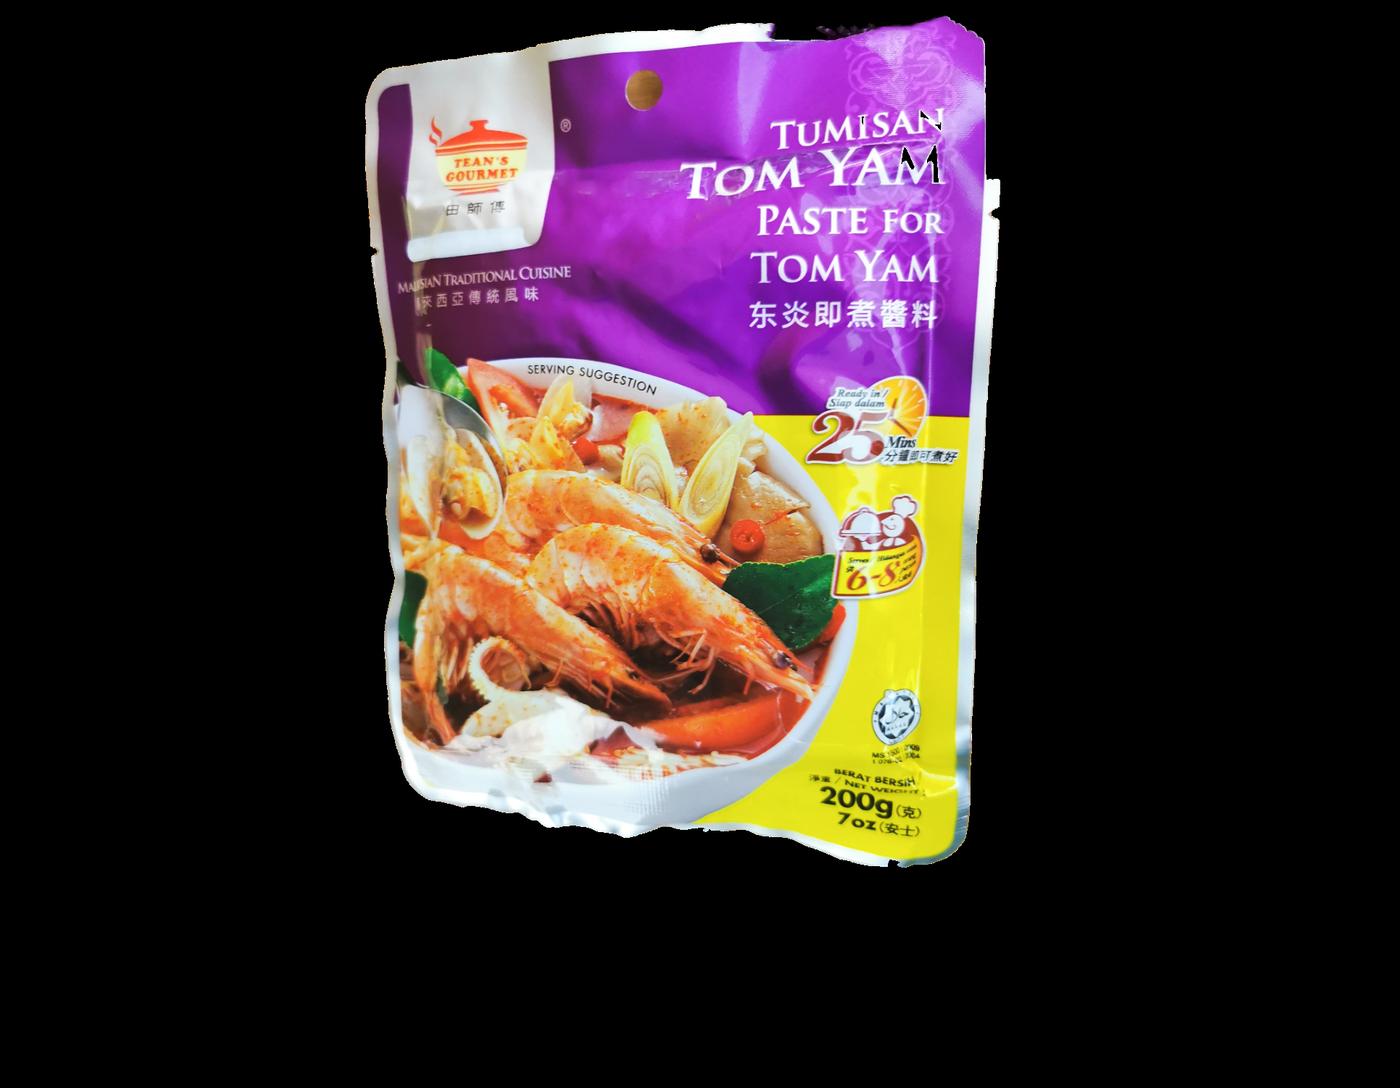 Teans Gourmet Tumisan Tom Yam (Paste for Tom Yam)